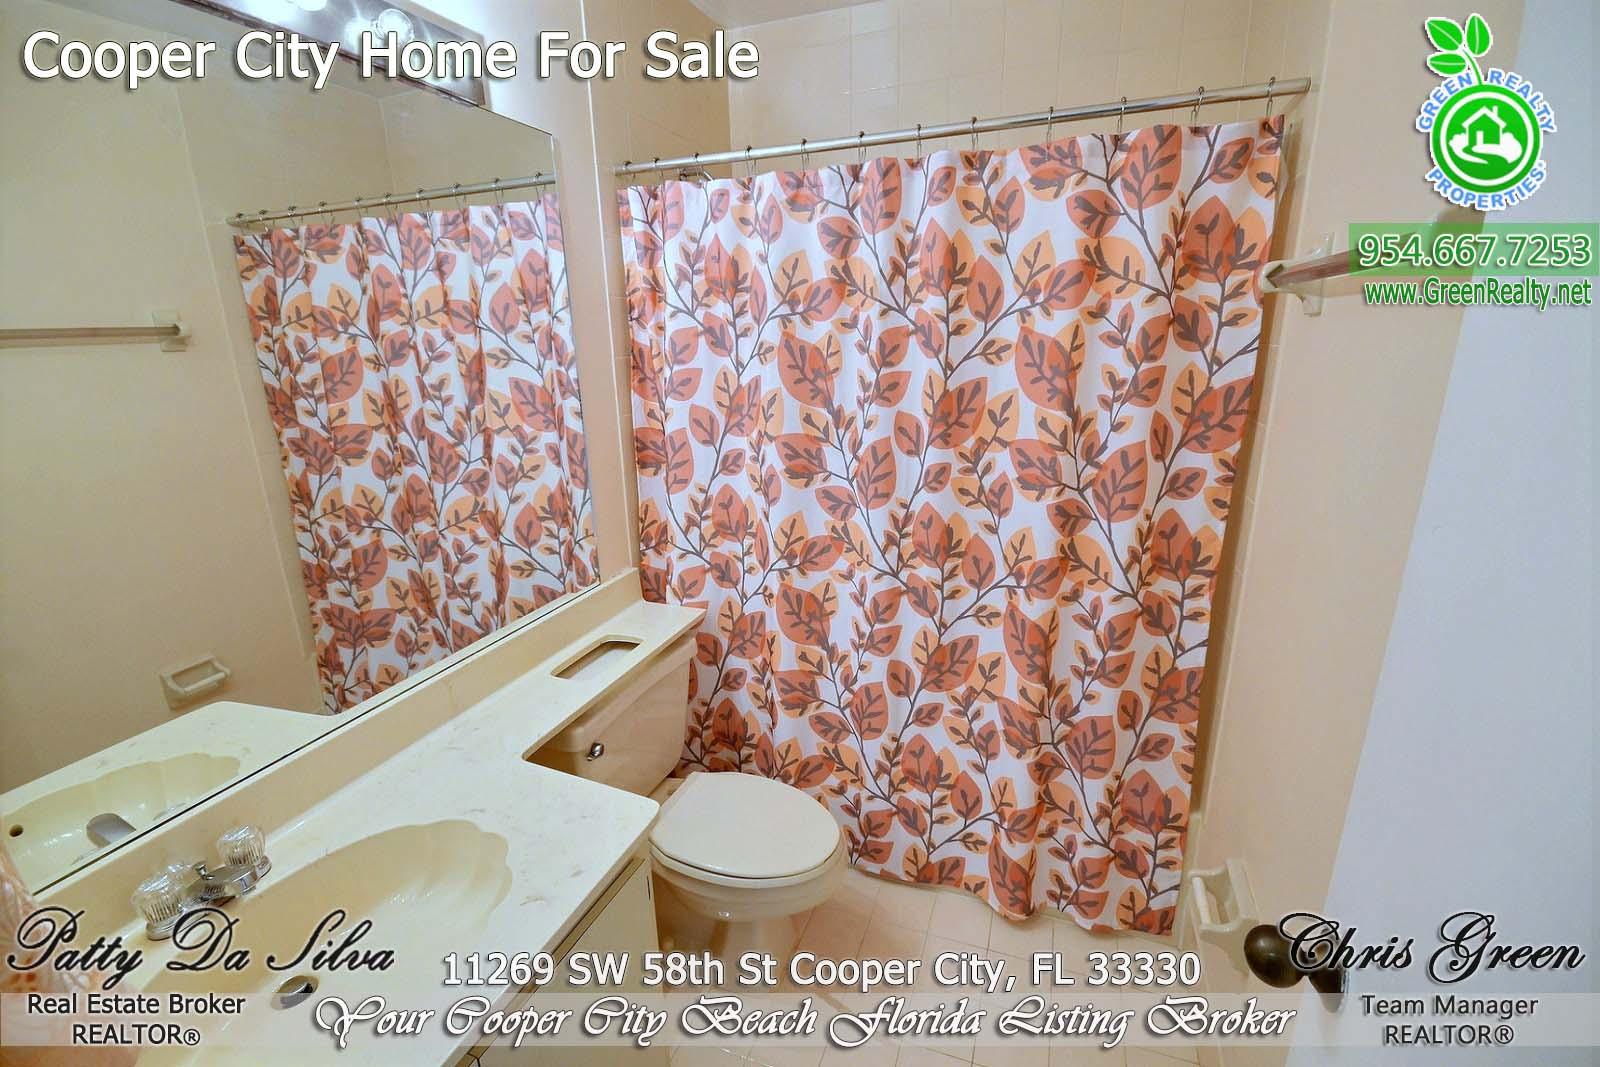 16 Cooper City Real Estate - Villas (22)